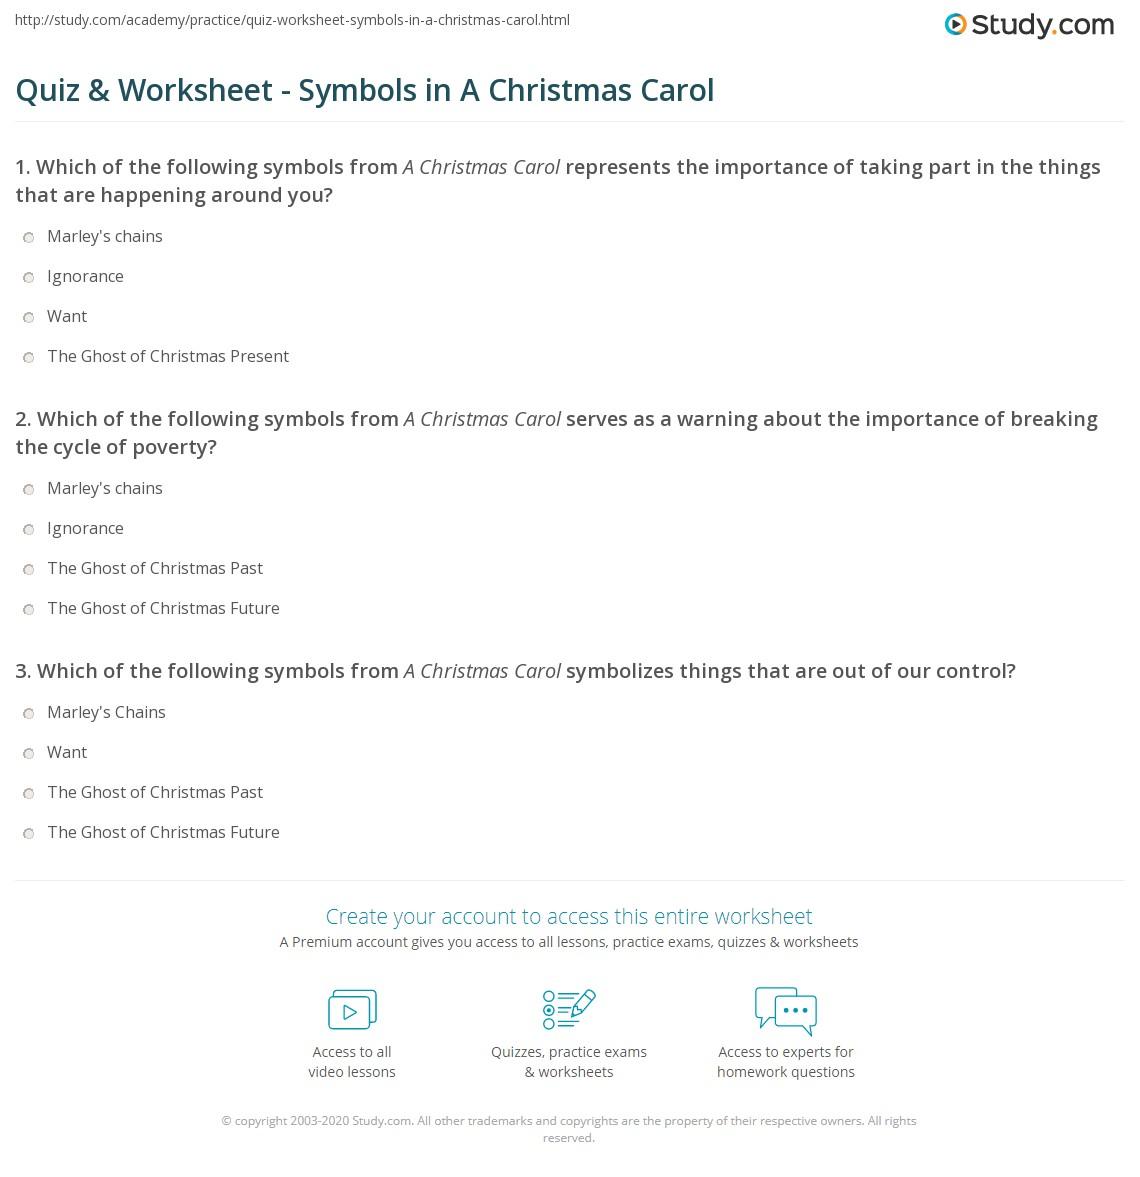 Quiz & Worksheet - Symbols in A Christmas Carol | Study.com